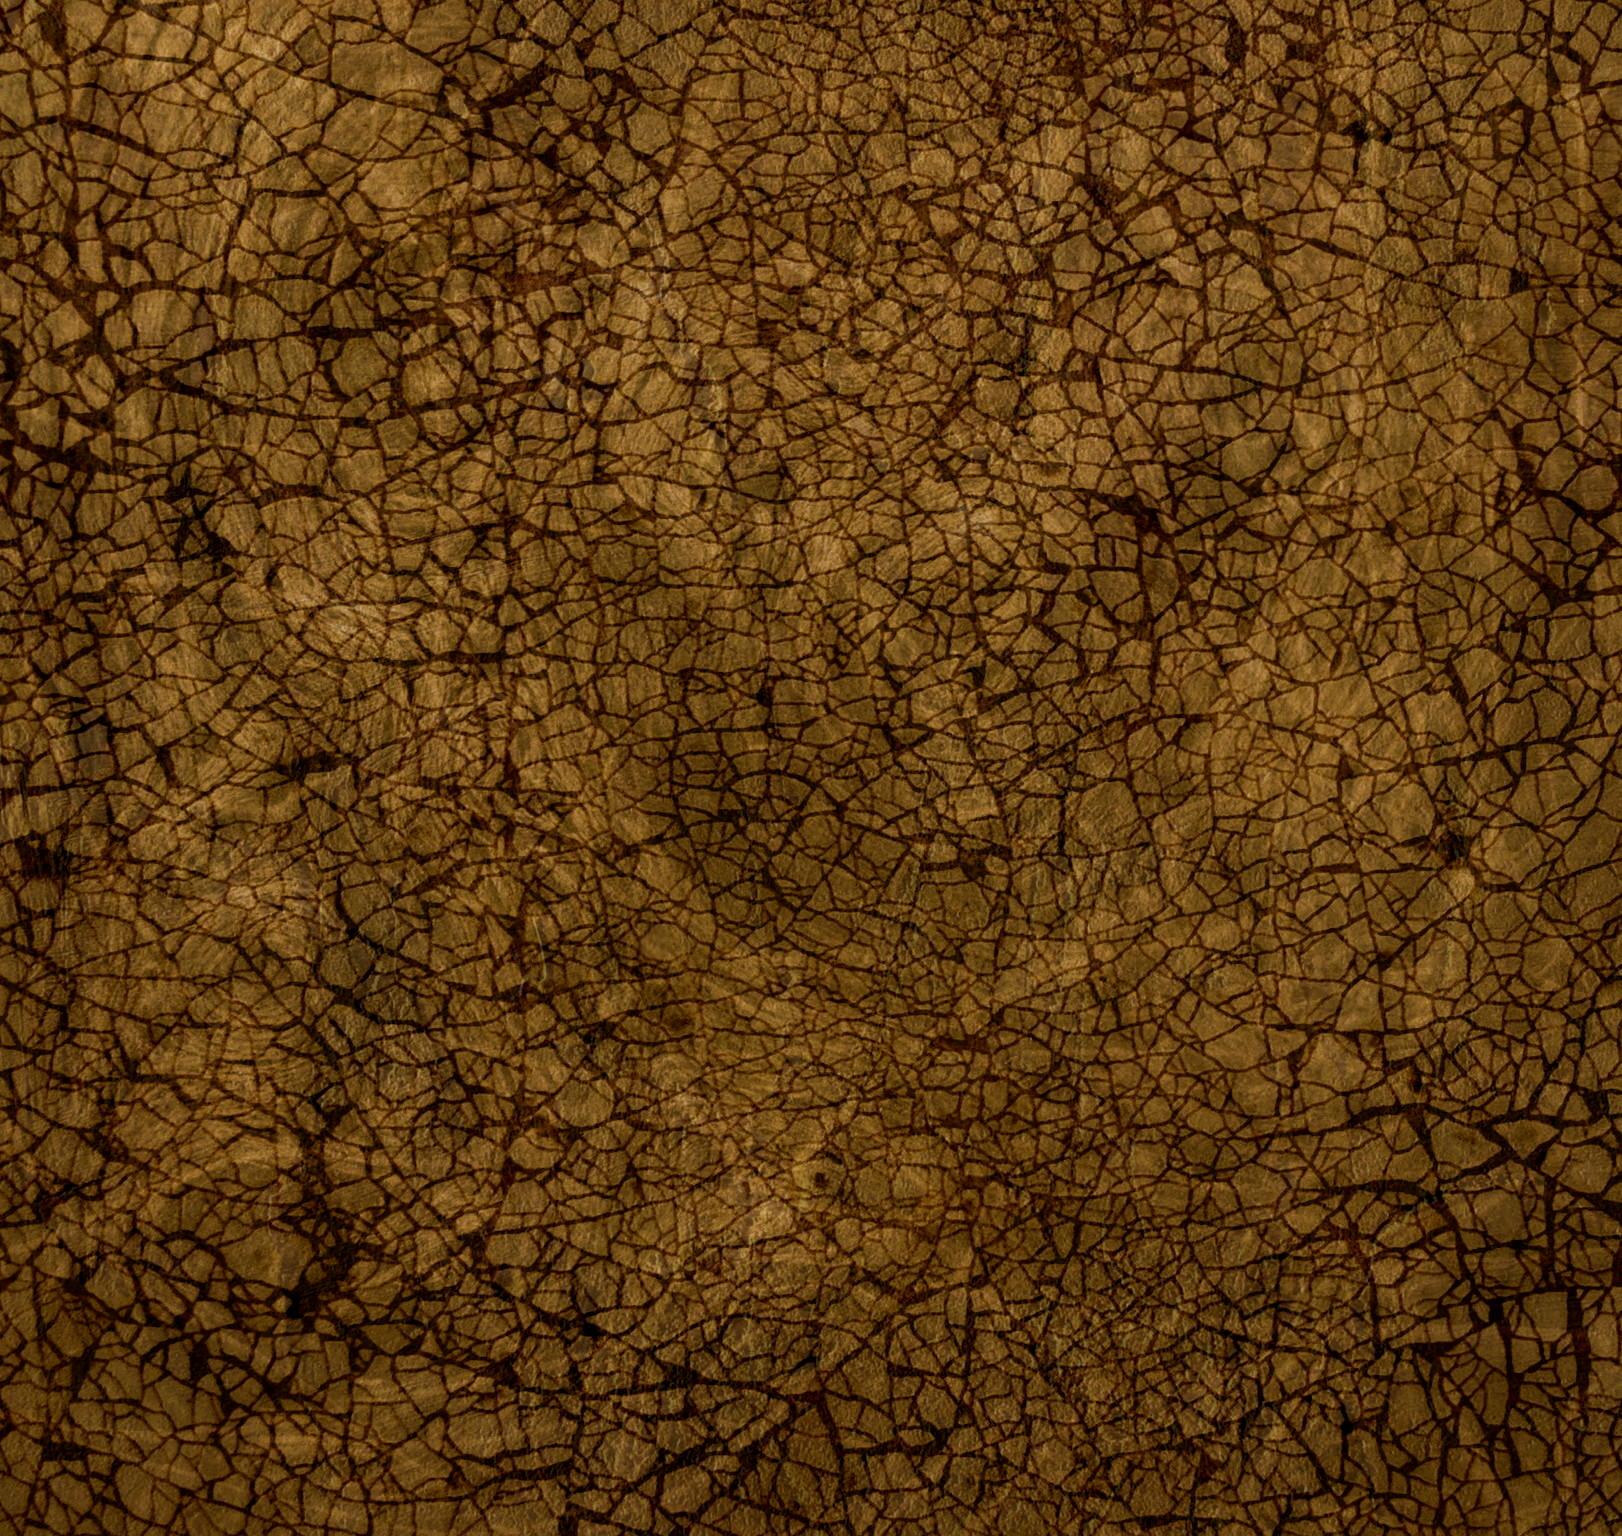 antique texture 24 by inthename stock resources stock images textures ...: inthename-stock.deviantart.com/art/antique-texture-24-71843271